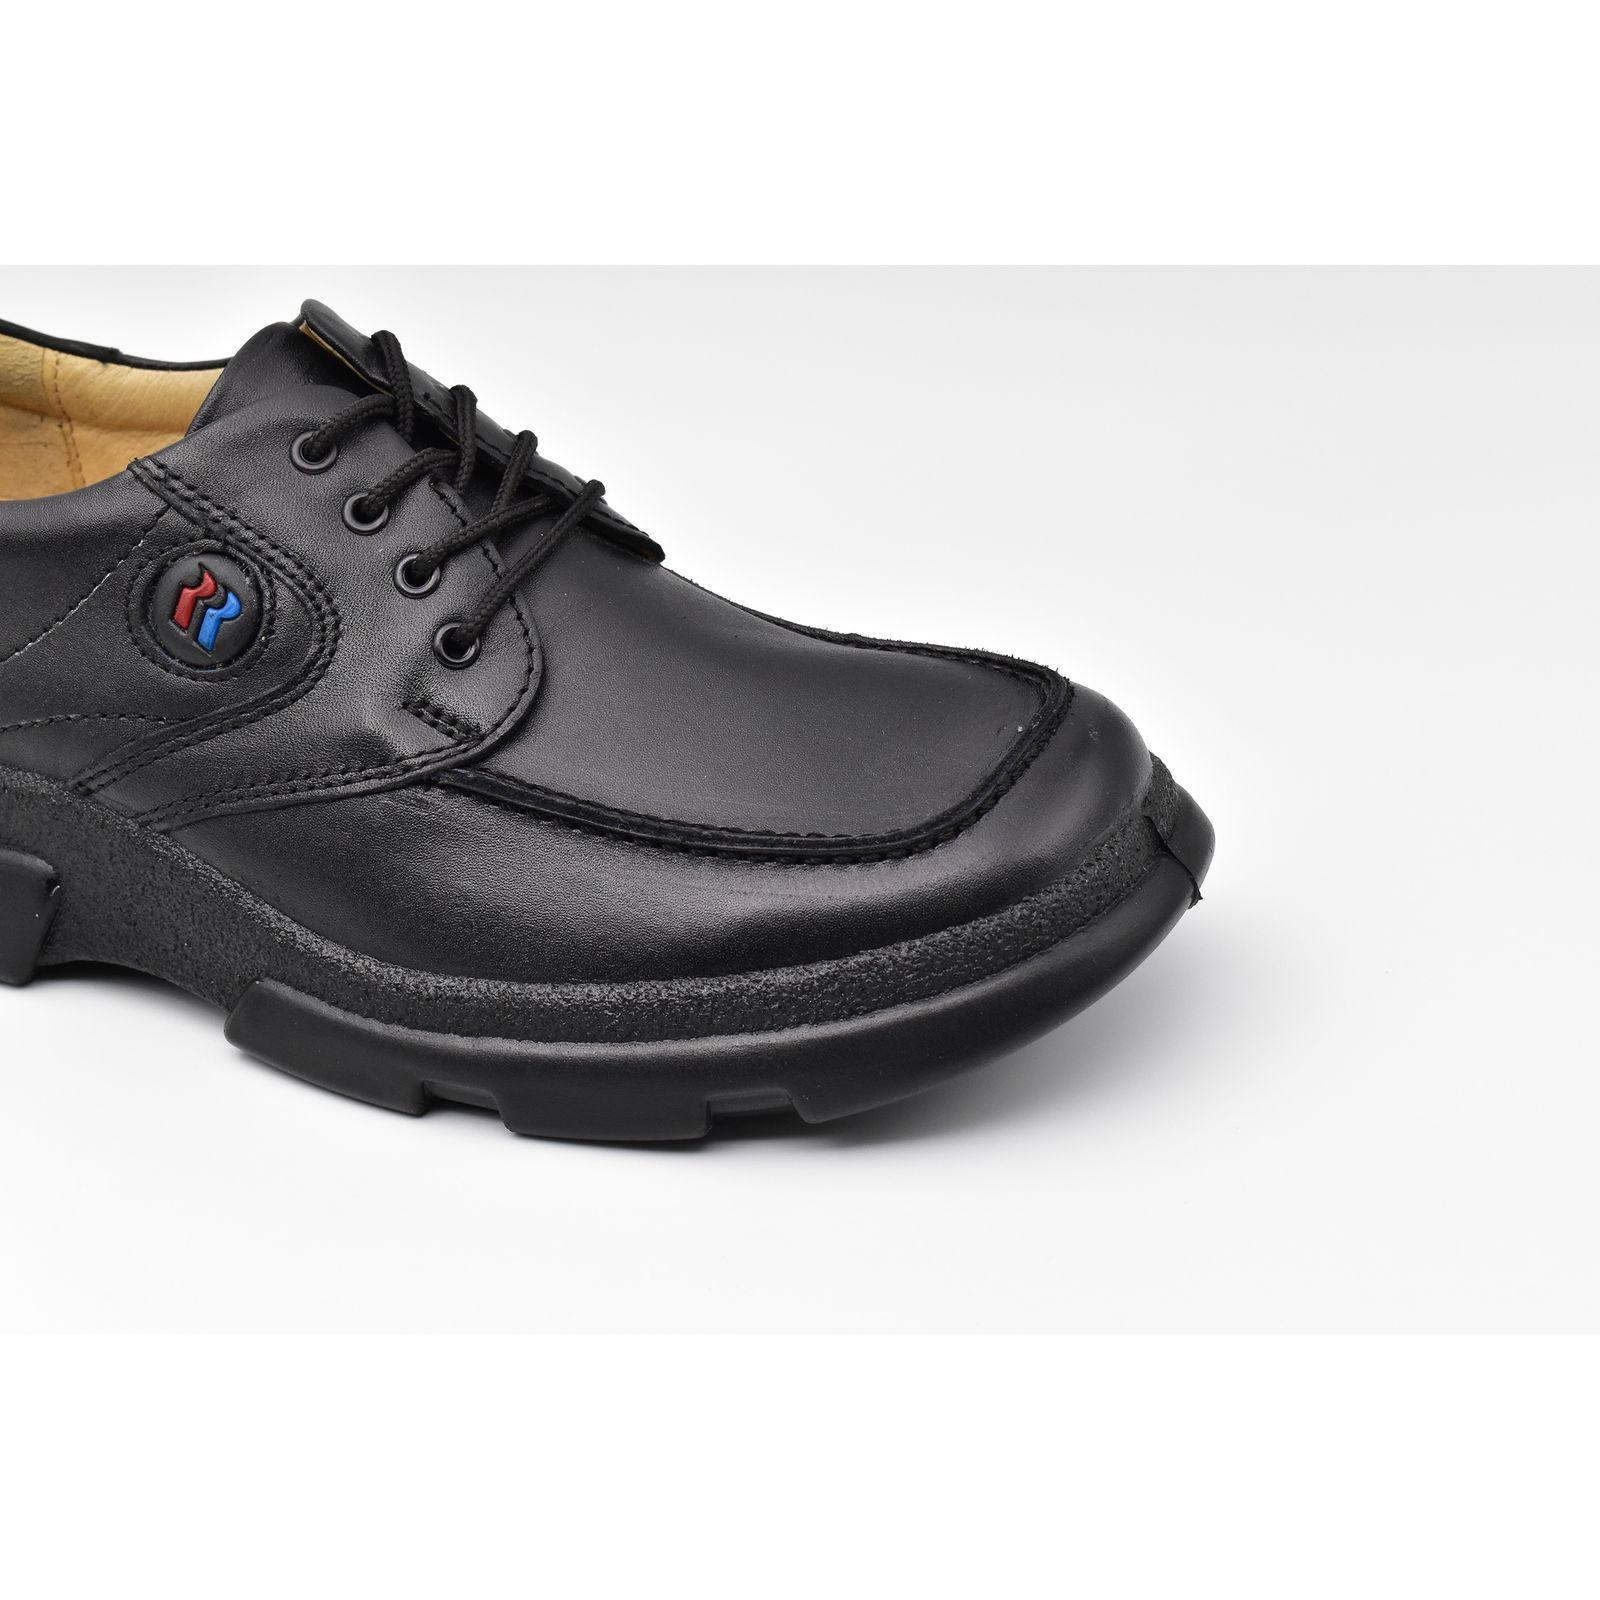 کفش روزمره مردانه البرز مدل تورنتو کد 7009 -  - 11